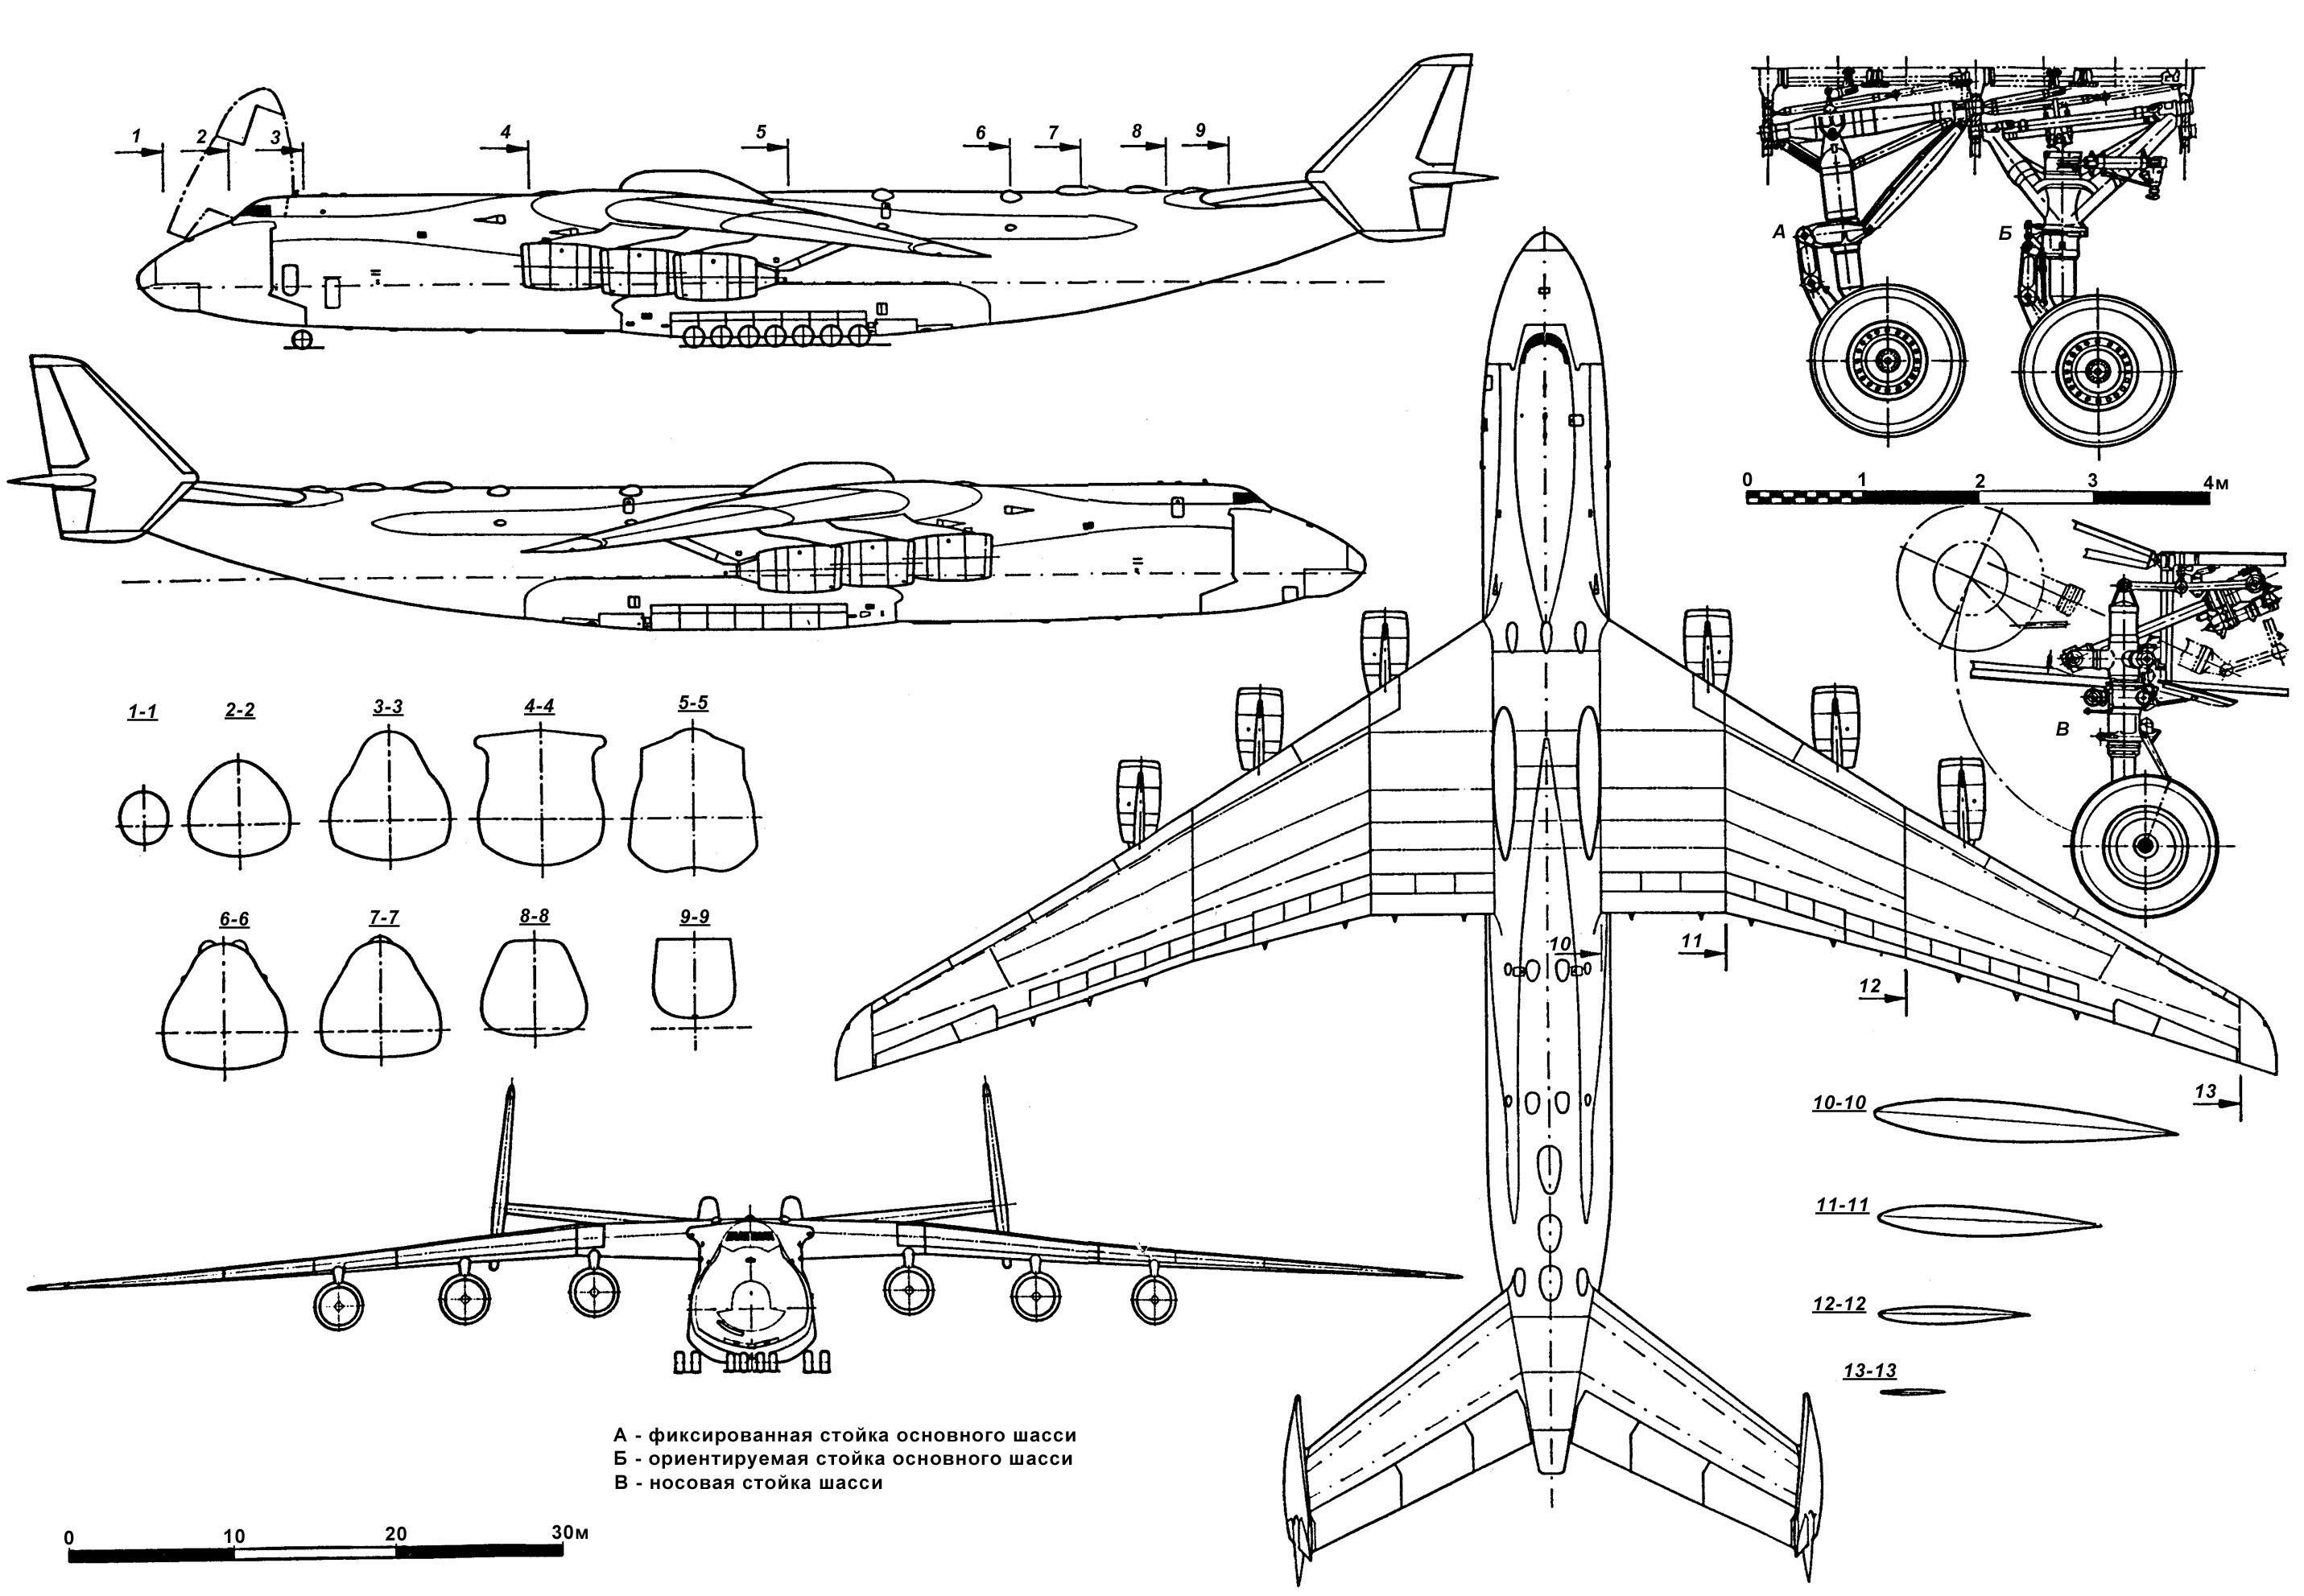 An-225 Mriya blueprint